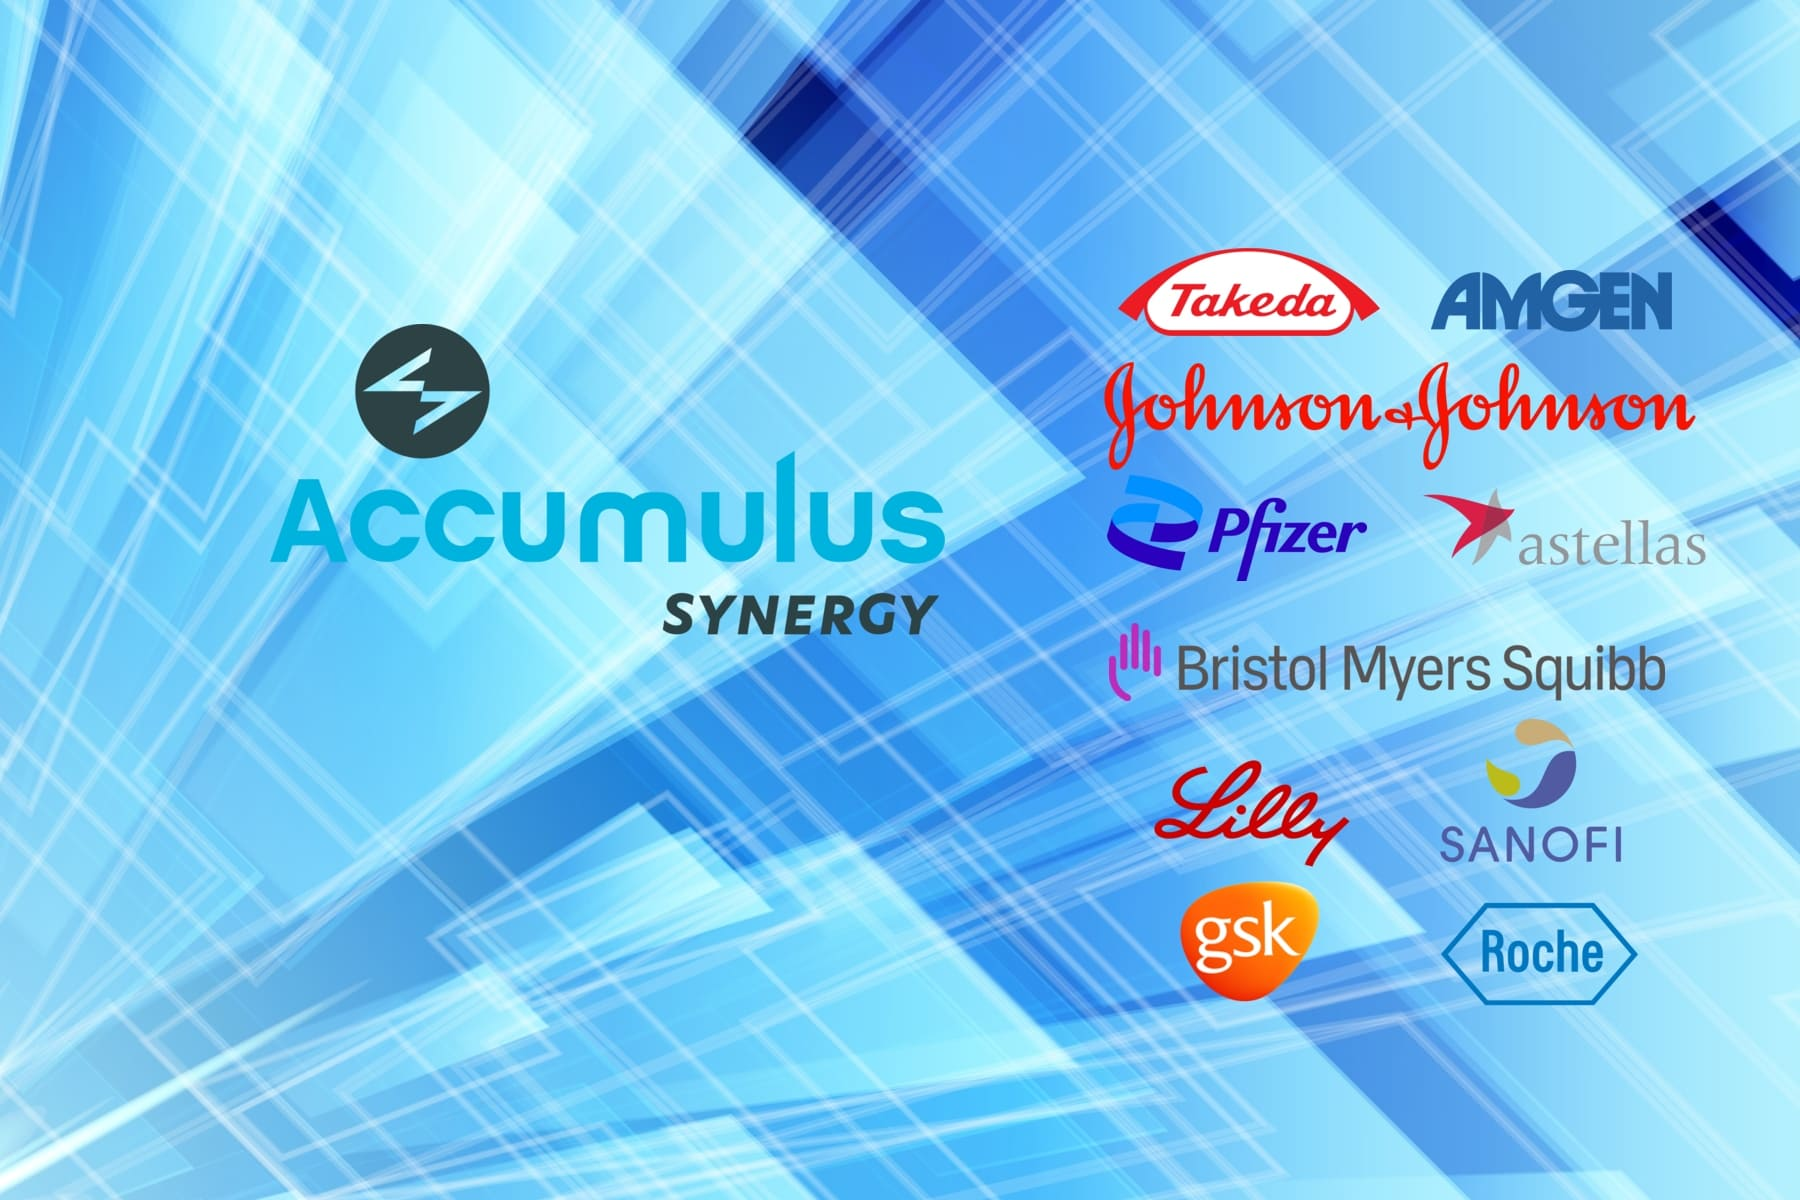 accumulus synergy